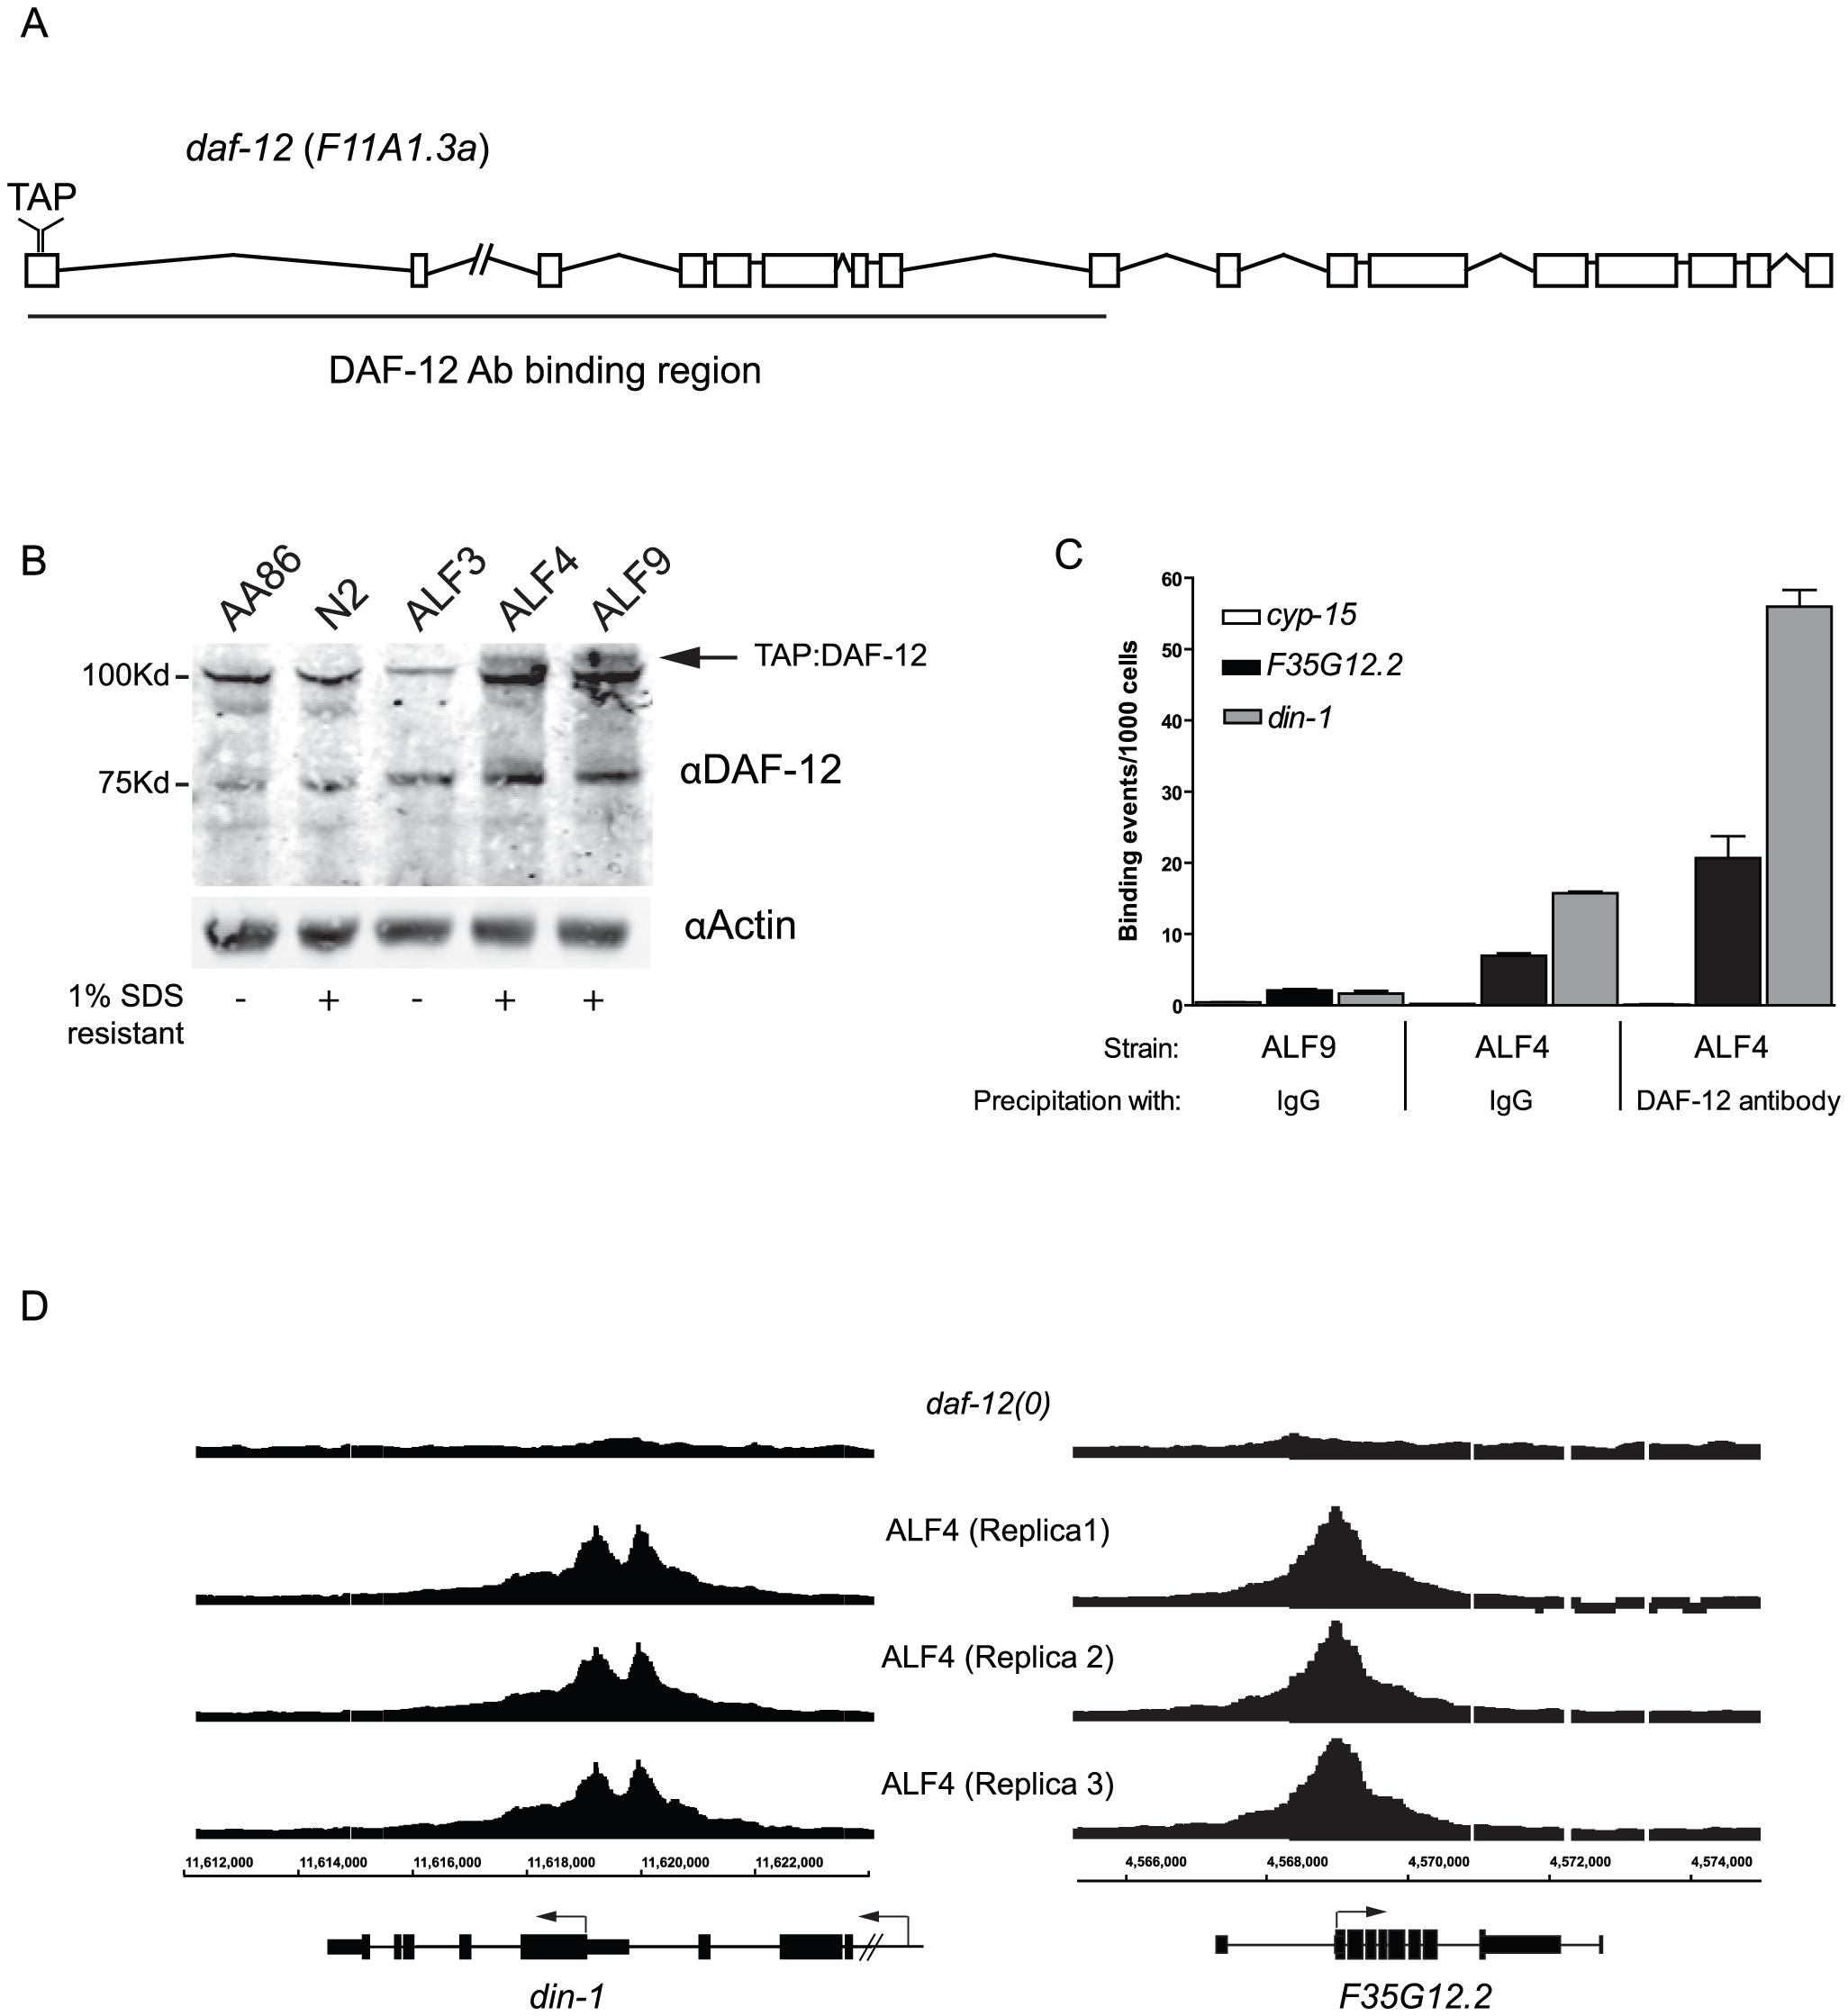 Generation of DAF-12 transgenic worms.